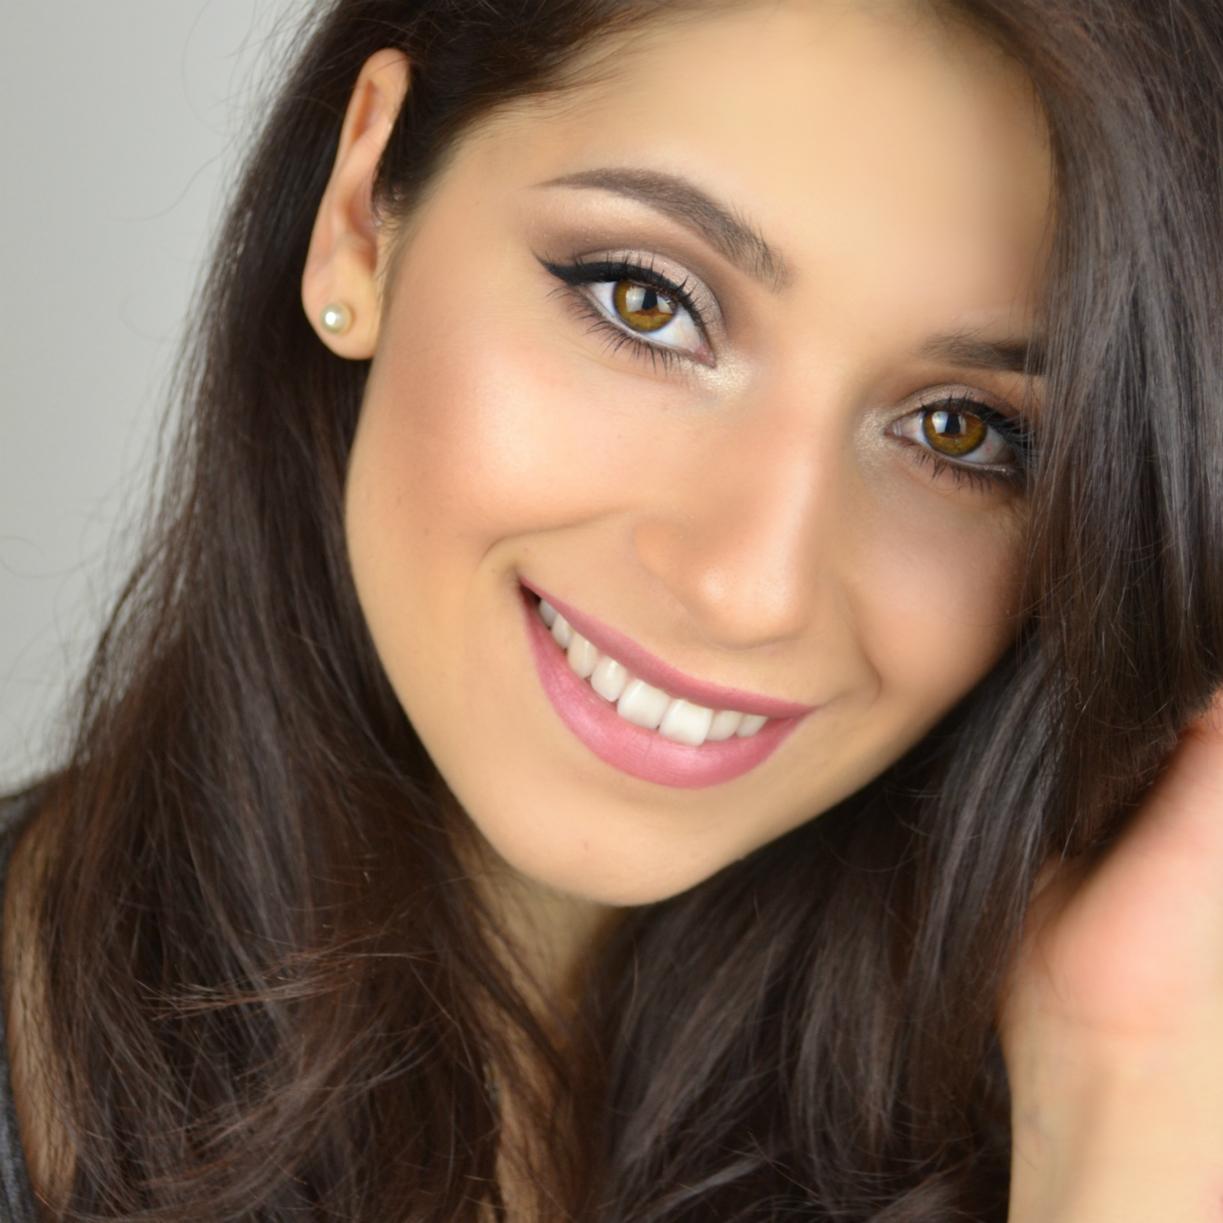 makeup-semplice-viso-naturale